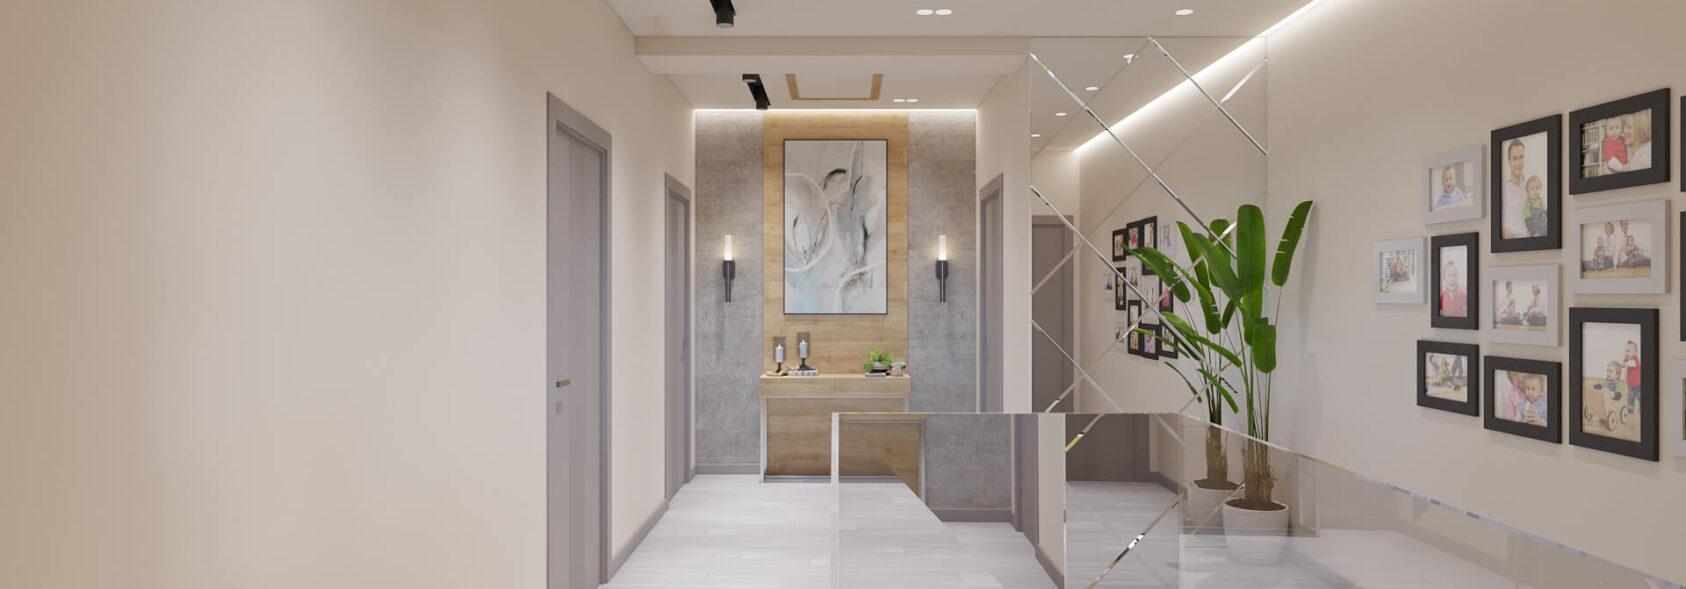 Дизайн дома Запорожье коридор